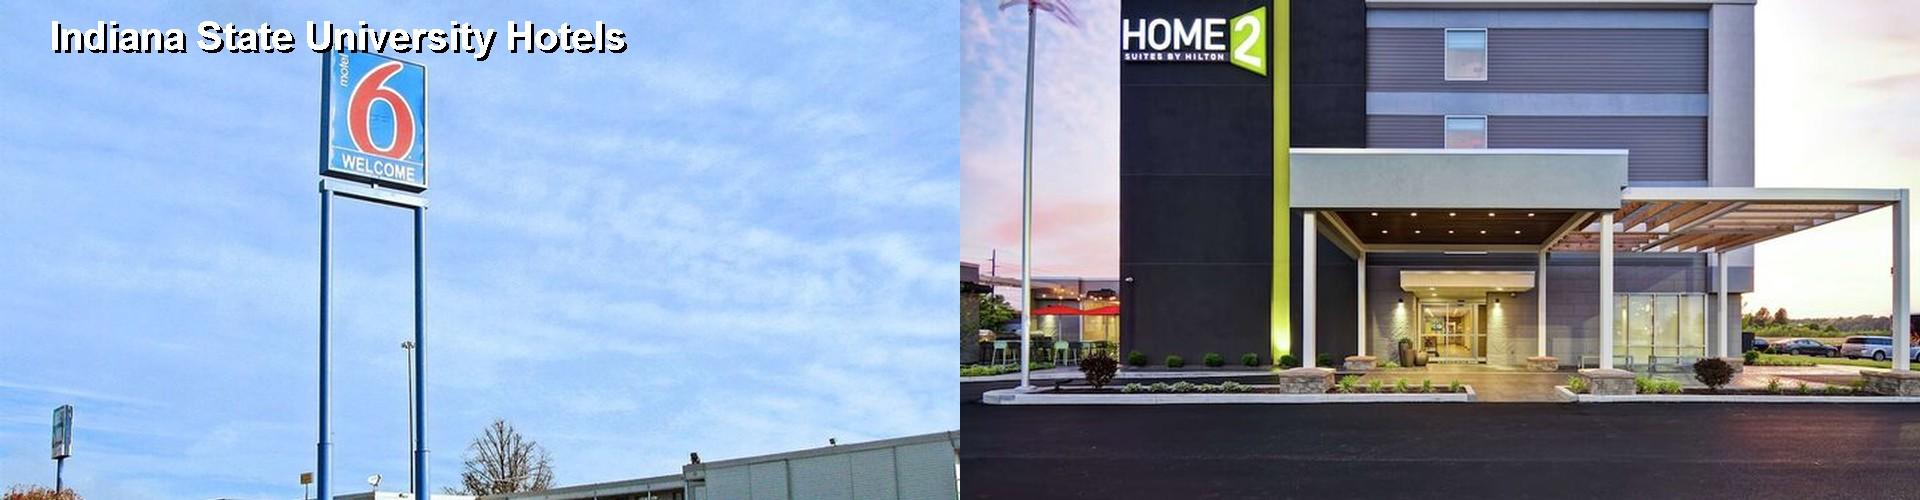 3 Best Hotels Near Indiana State University